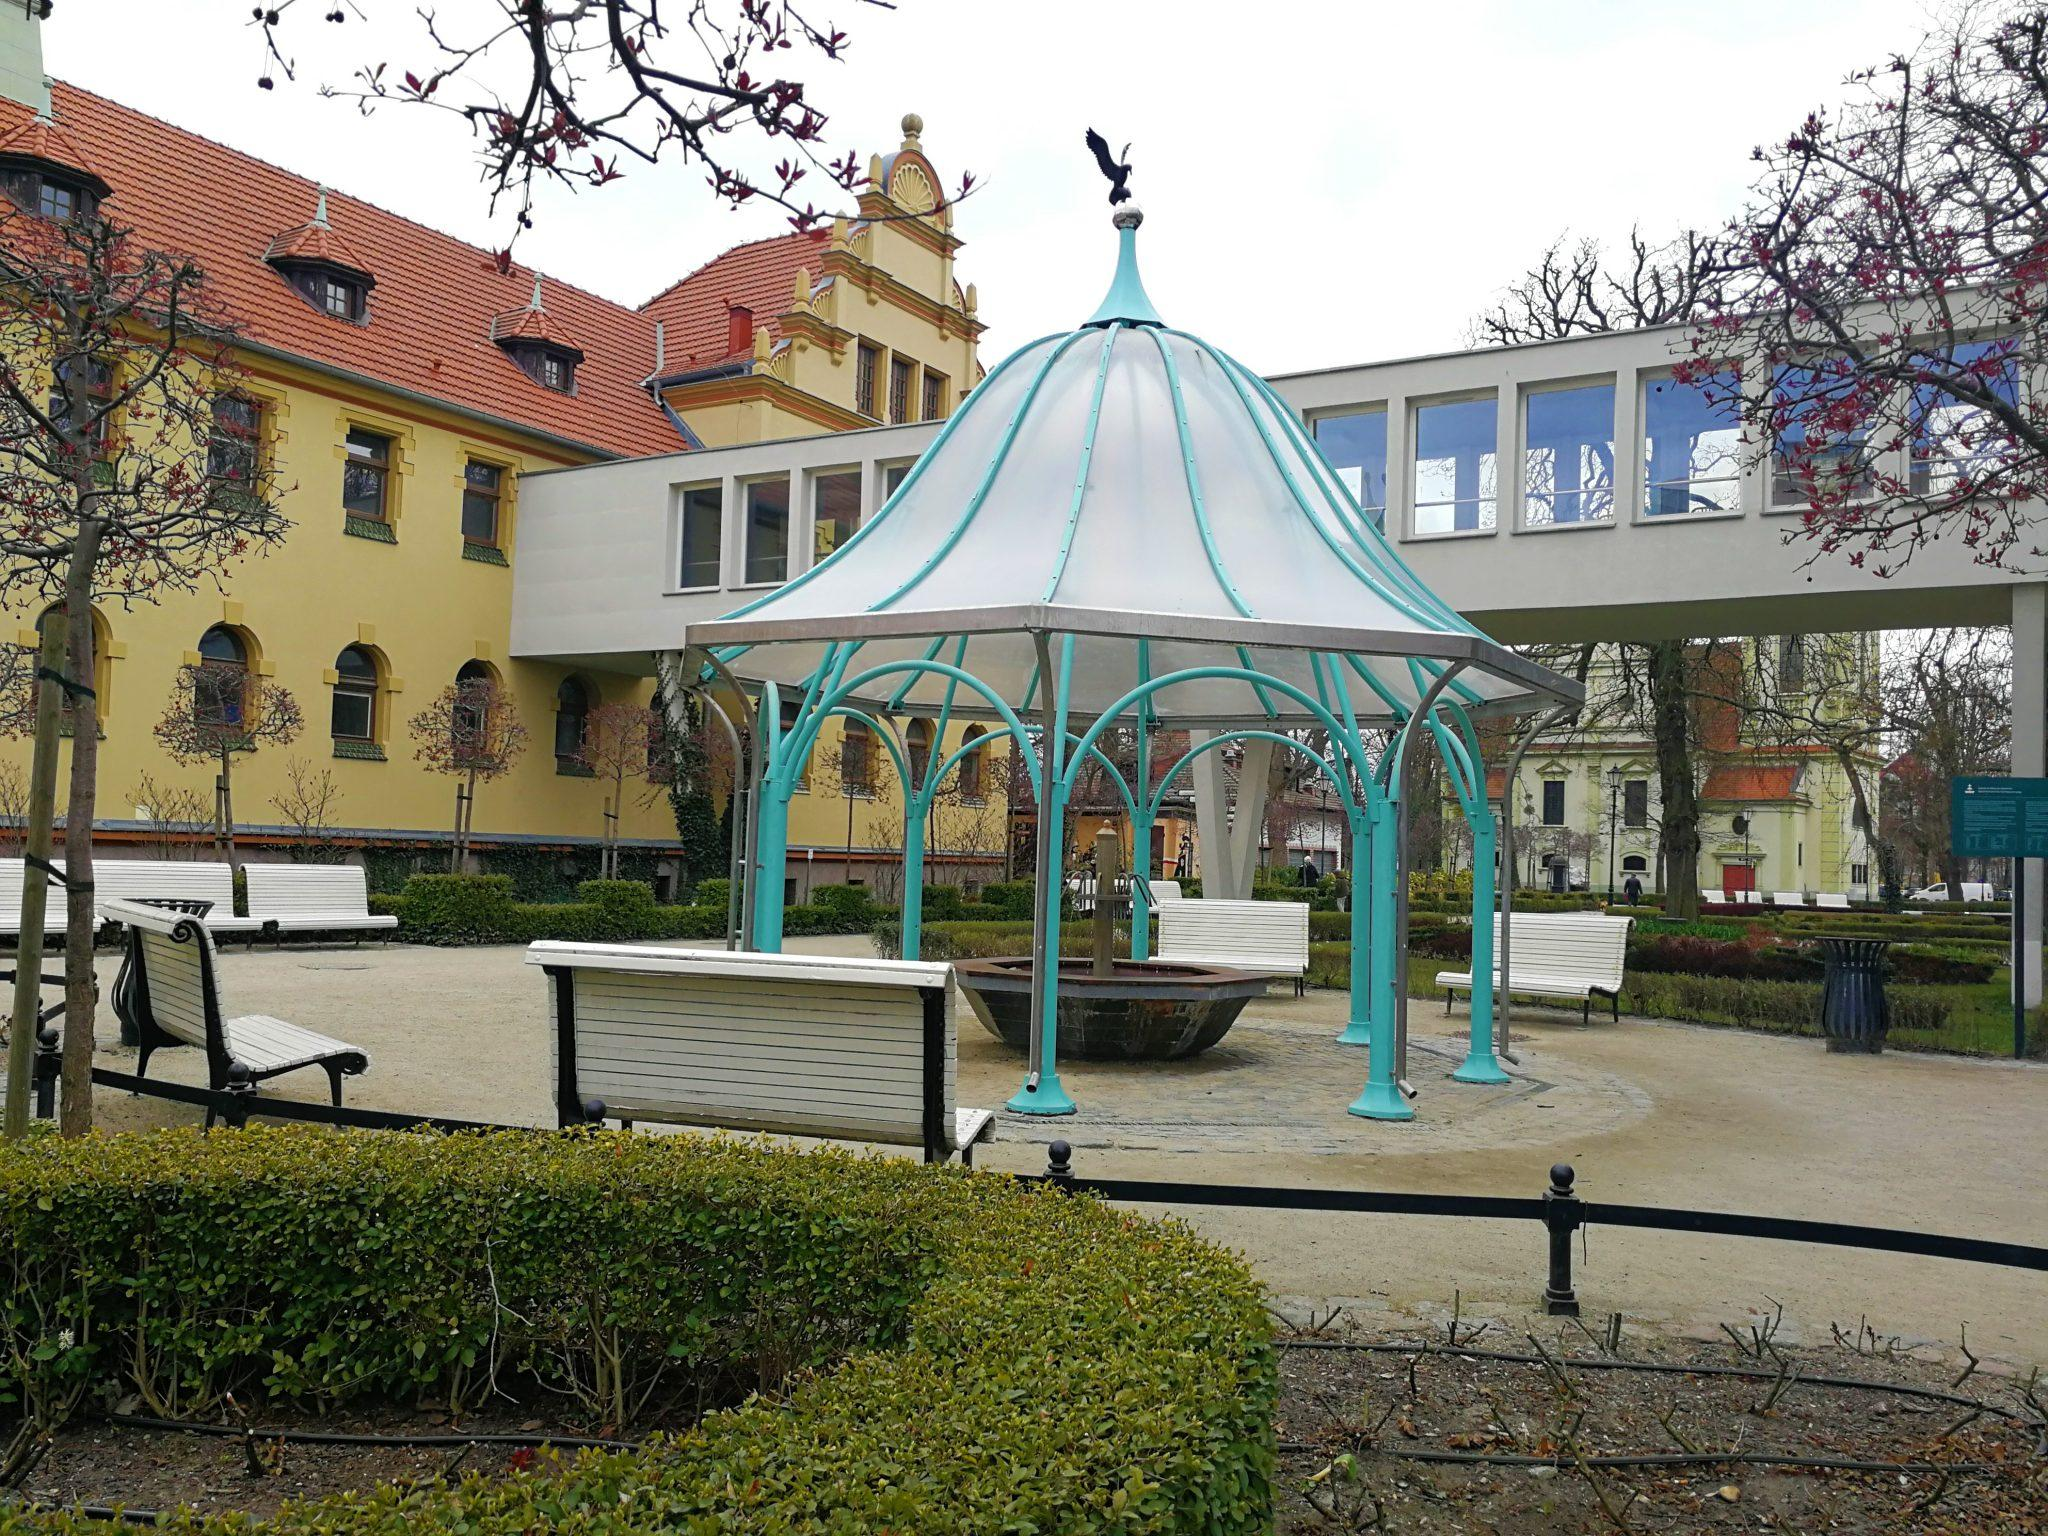 fontanna-z-solanka-Sopot-zdj.-Ania-Anna-Kotula-z-Tour-Guide-Service-Gdansk